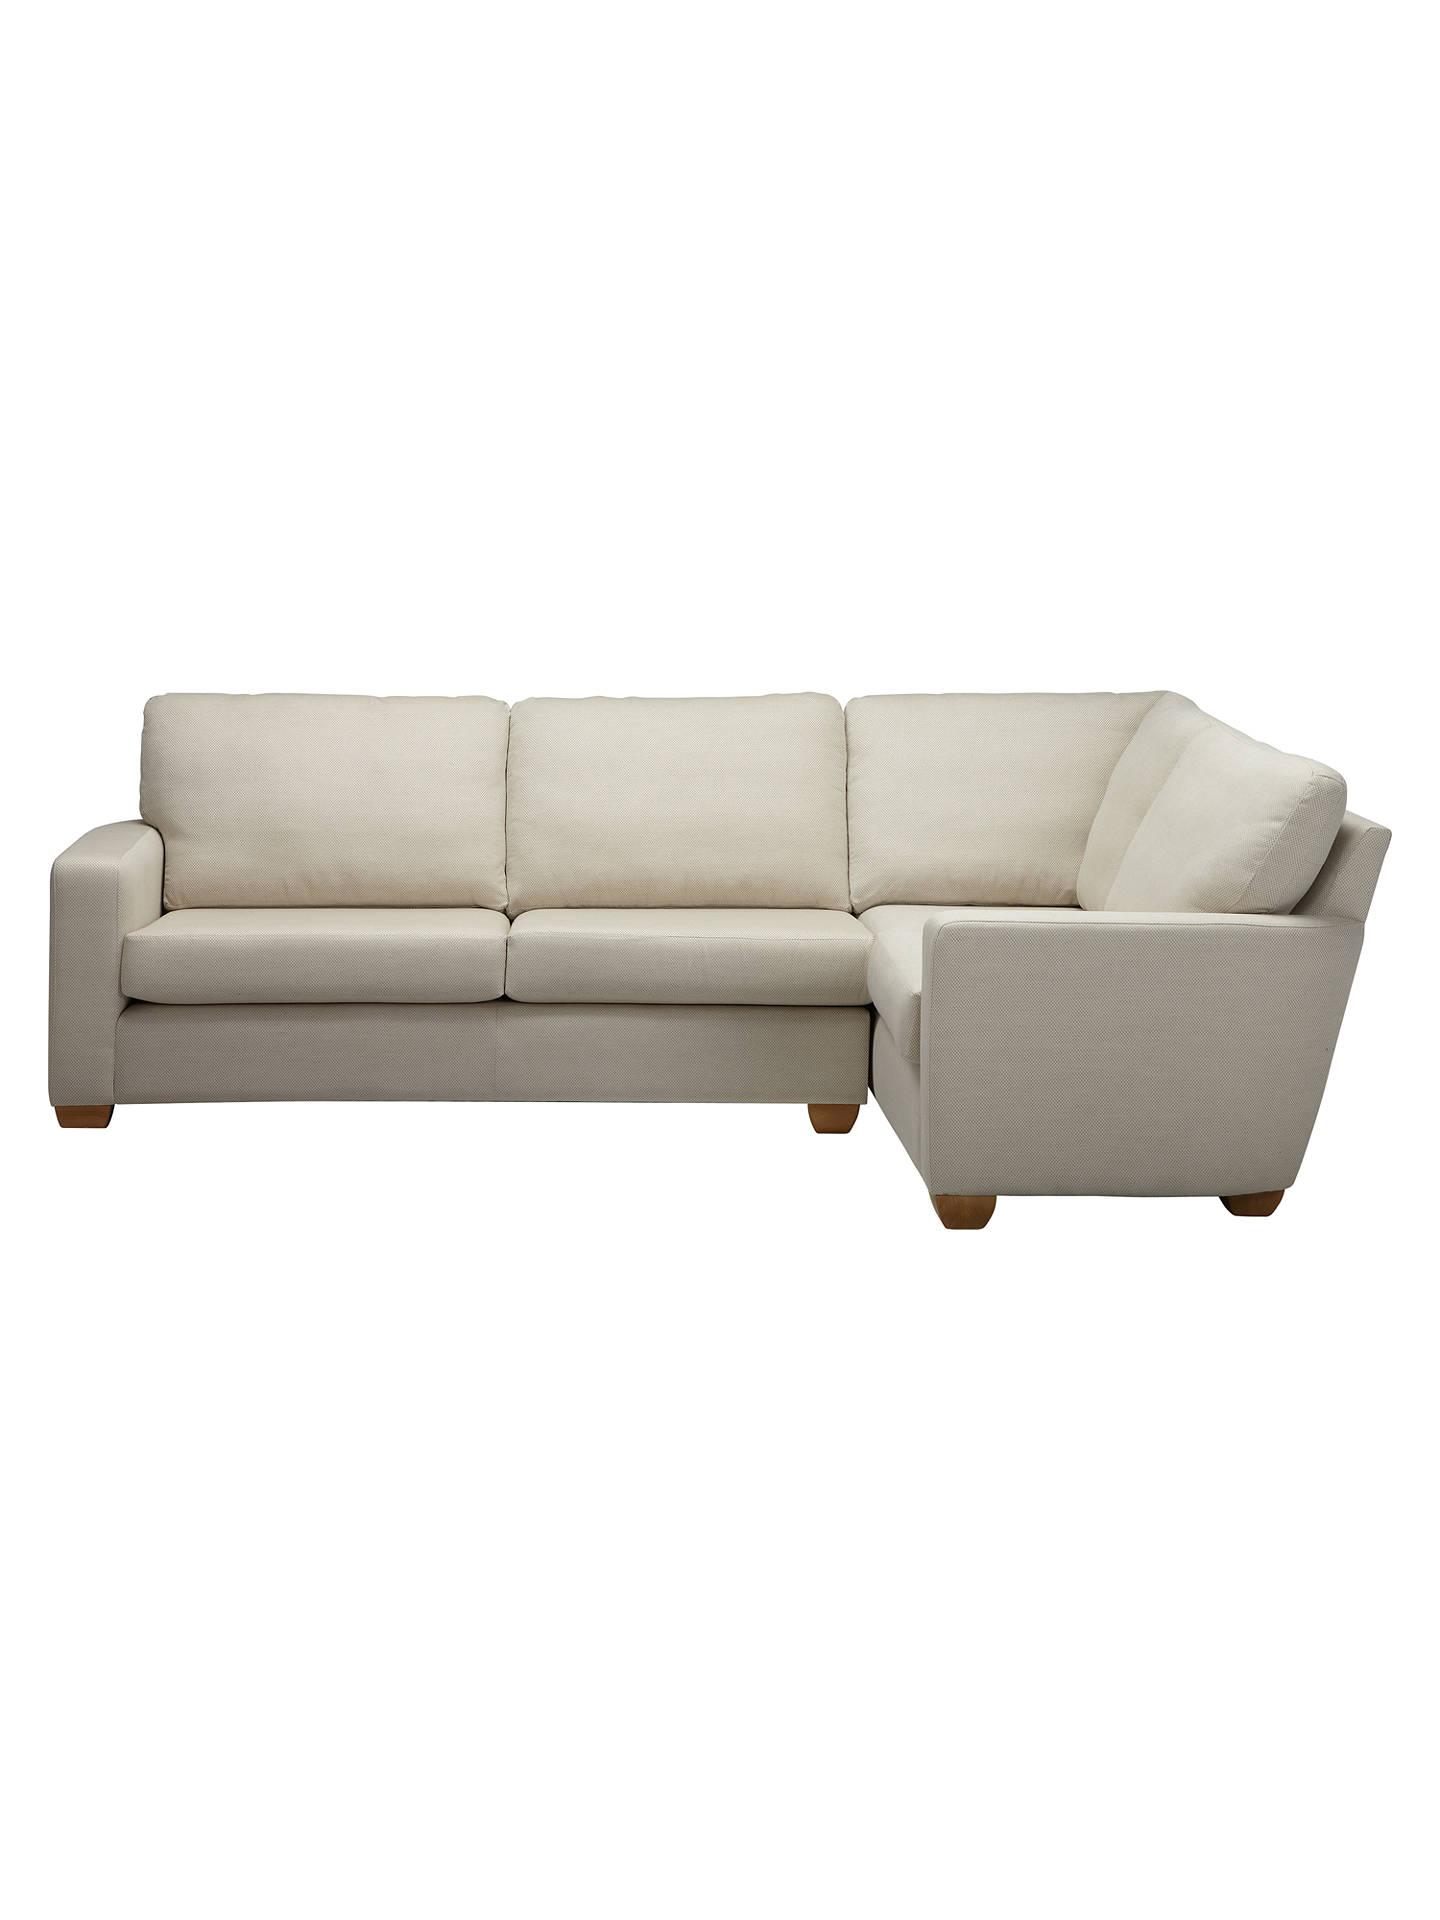 John Lewis Gino Rhf Medium Corner Sofa Checkmate Natural At John